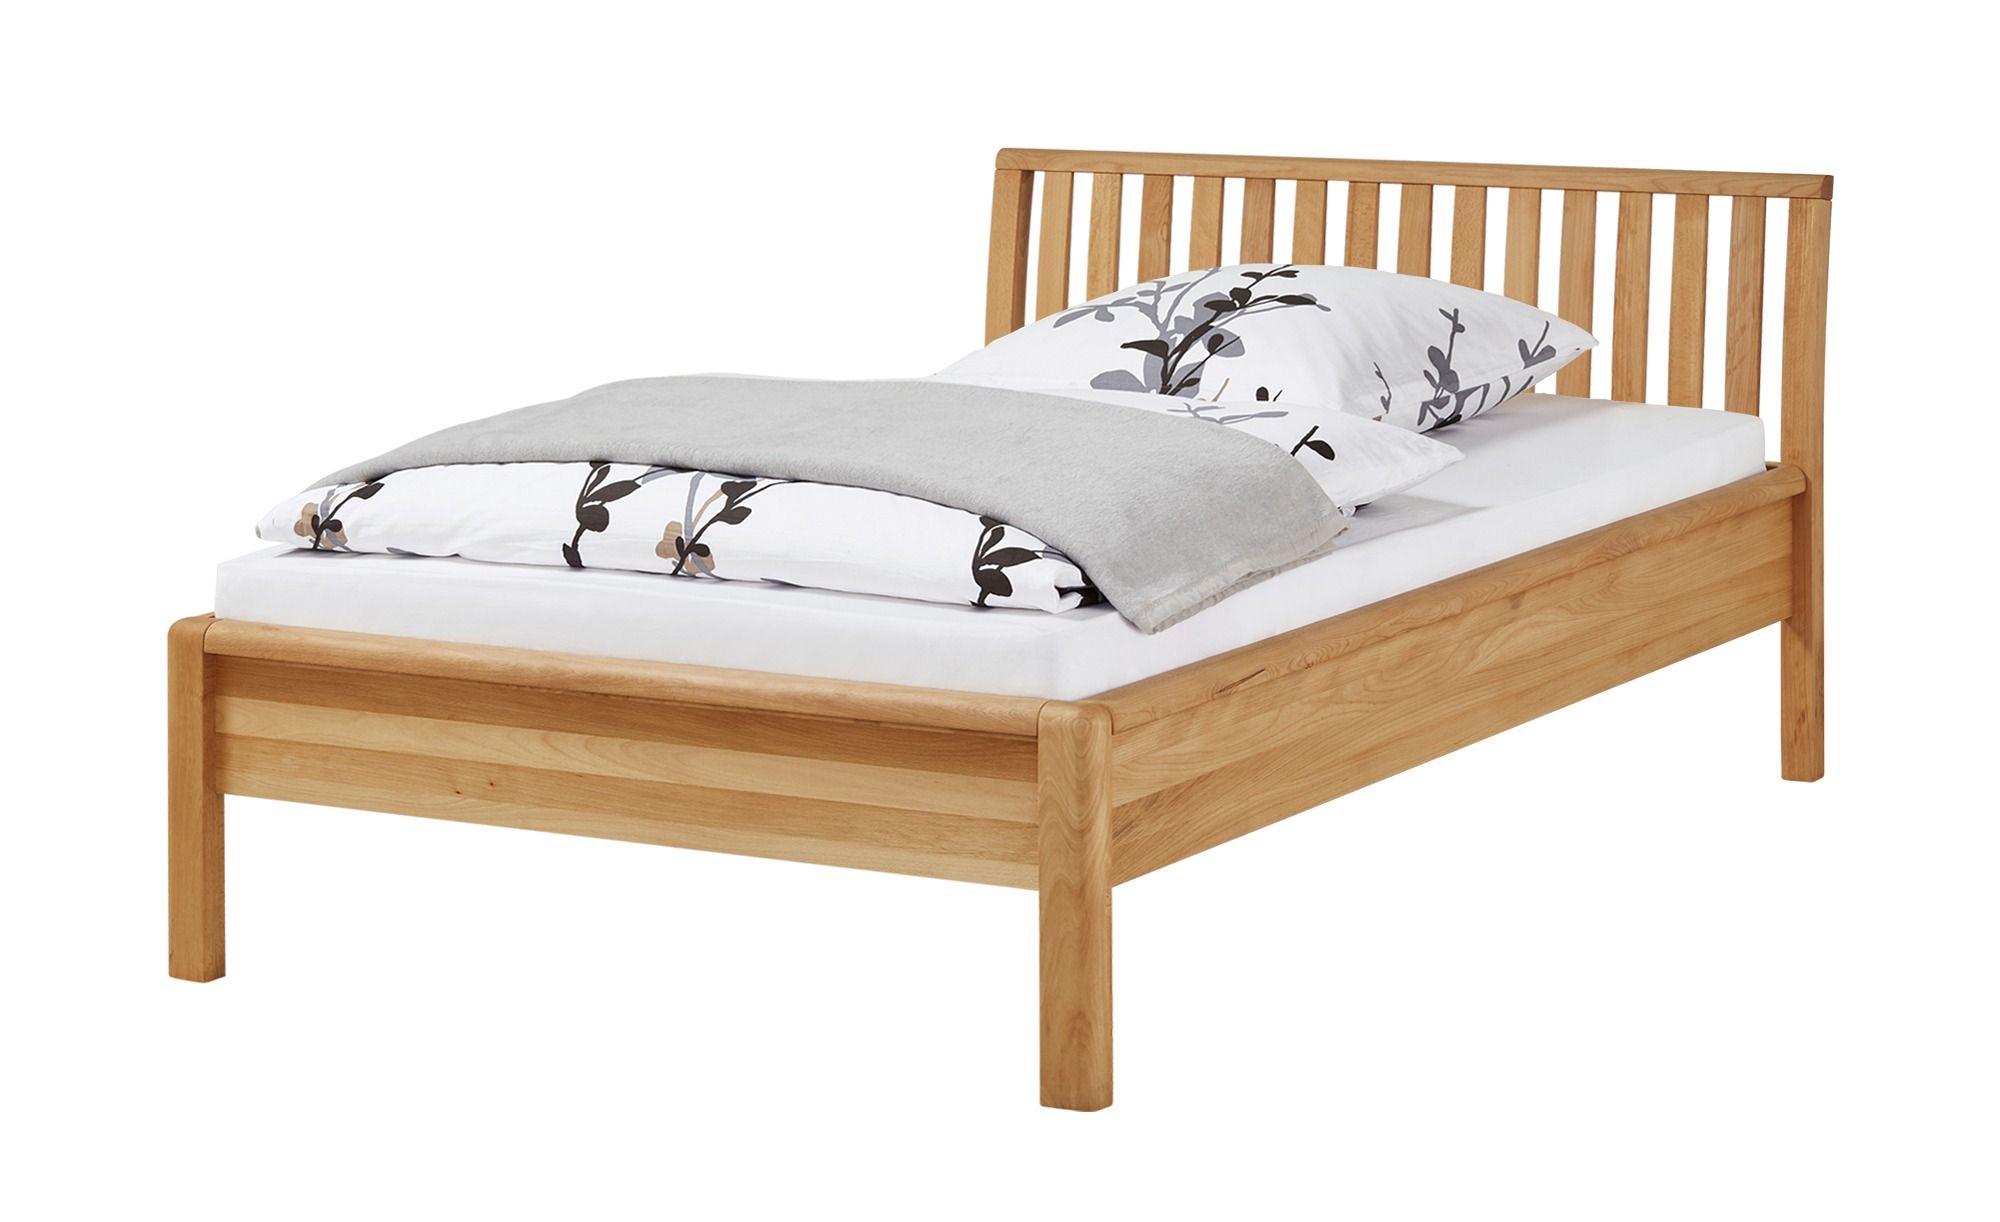 Massivholzbettgestell 140x200 Buche Alice Holzfarben Bett Und